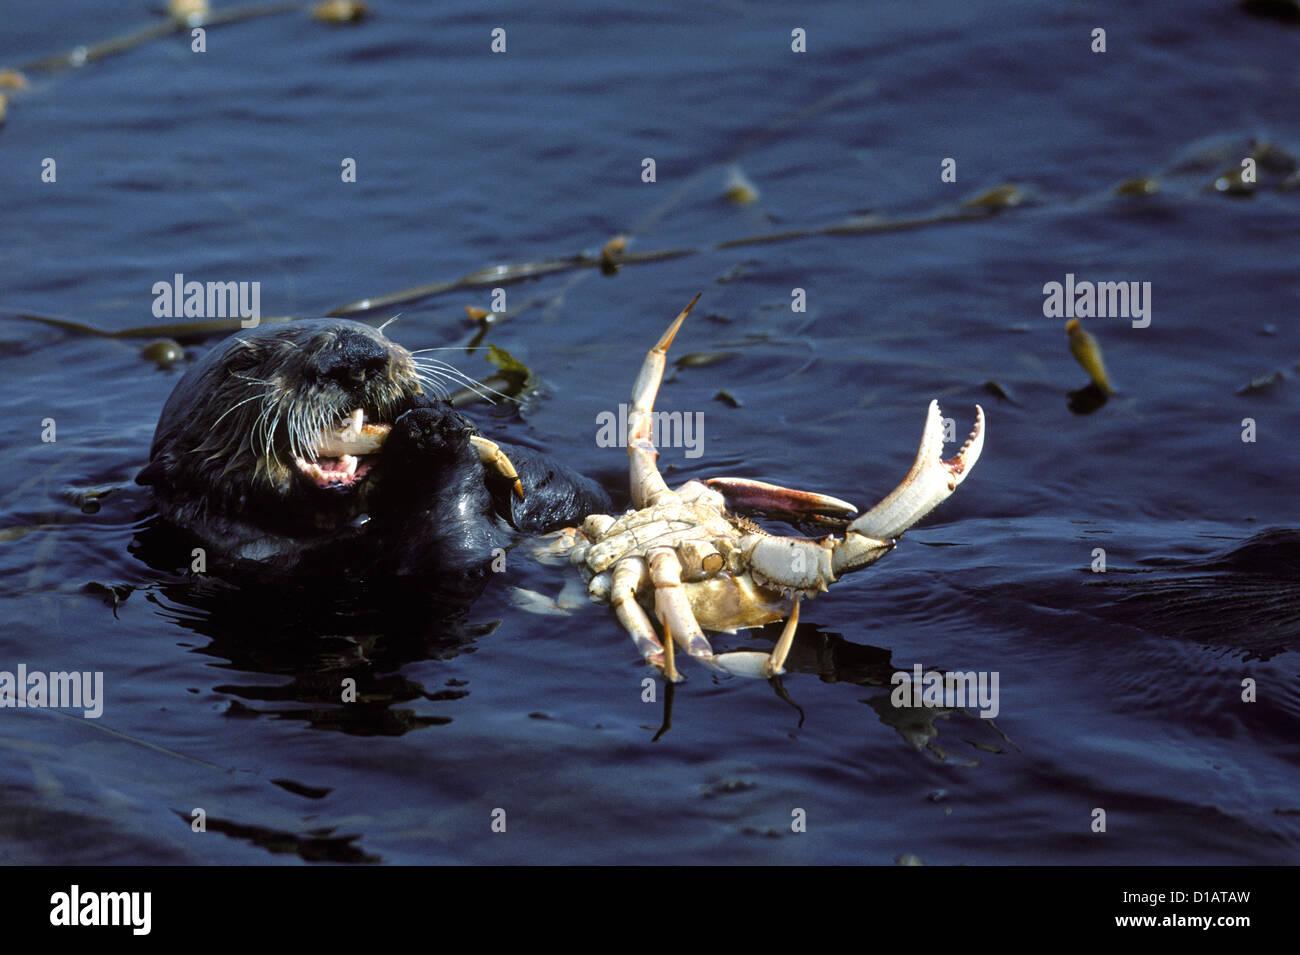 Sea otter.Enhydra lutris.Feeding on crab..Monterey Bay, Pacific Ocean, California, USA - Stock Image